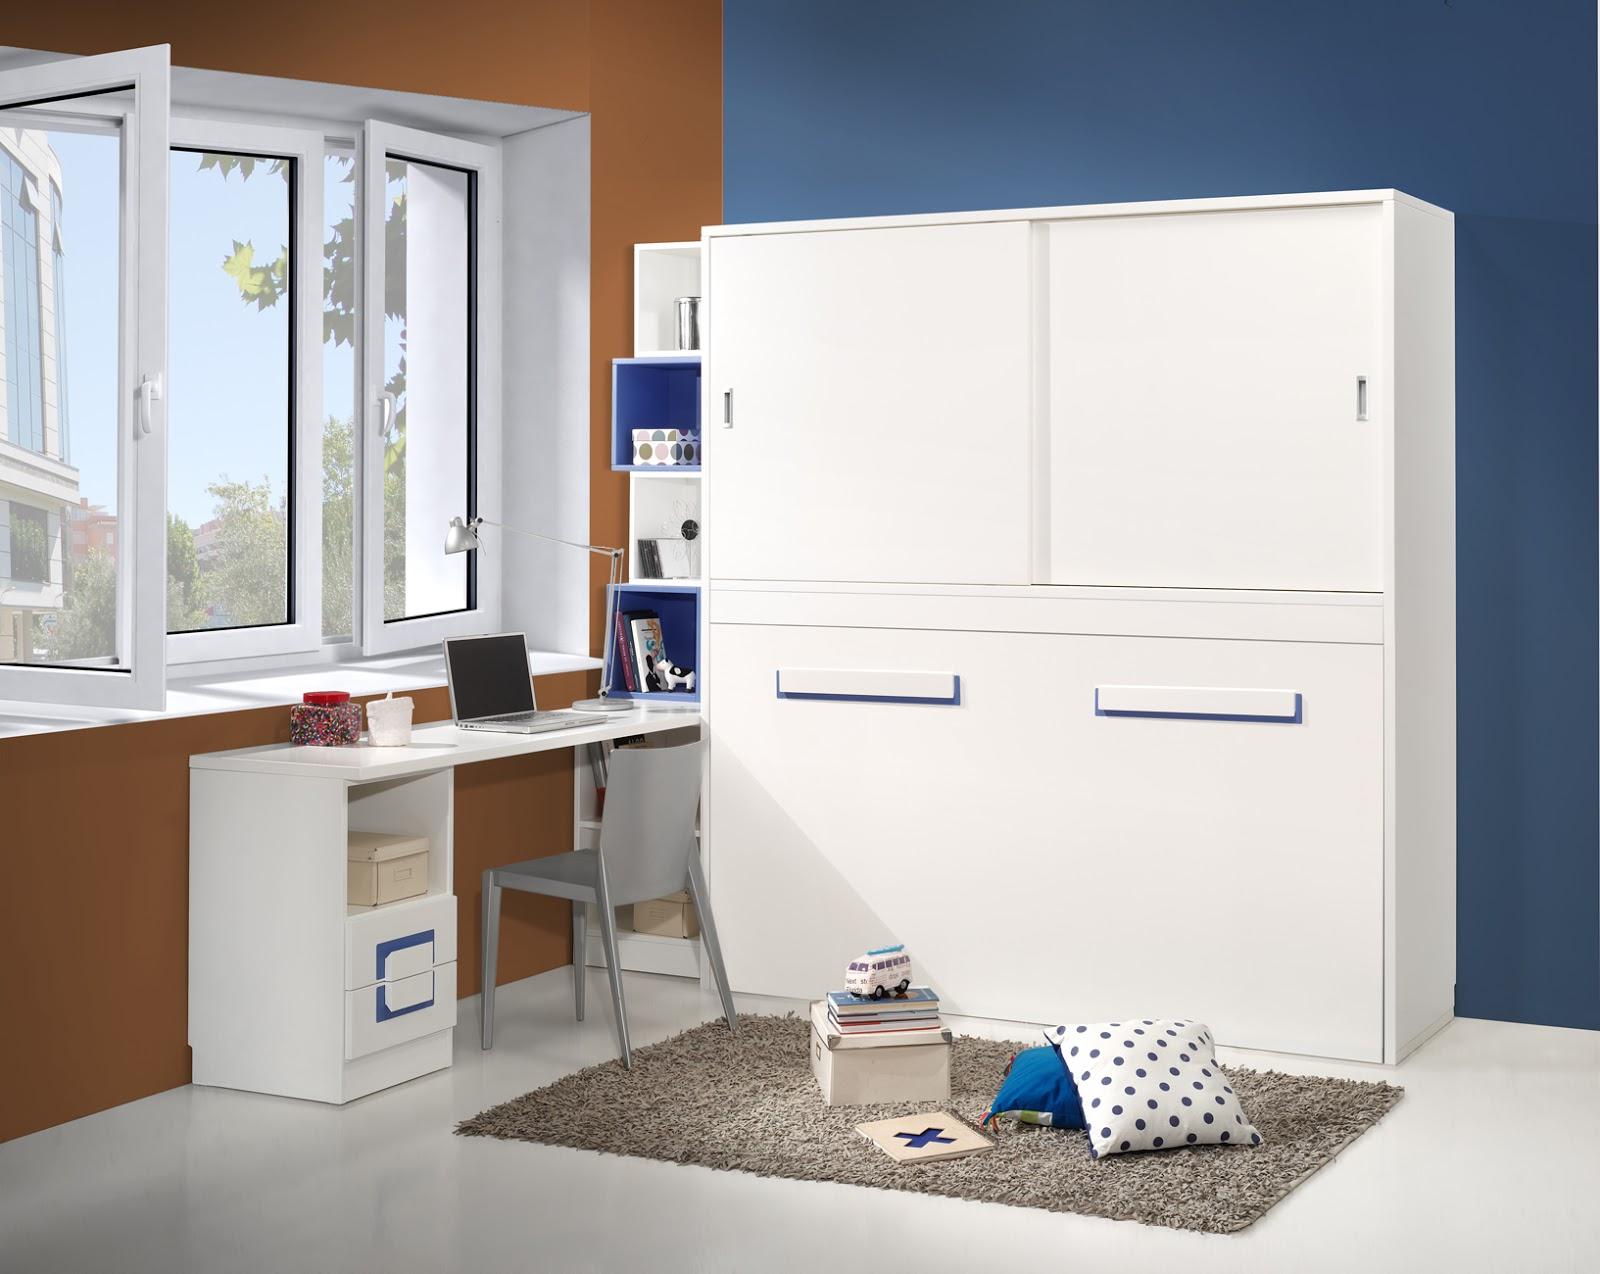 Camas abatibles camas empotradas de pared for Cama individual blanca